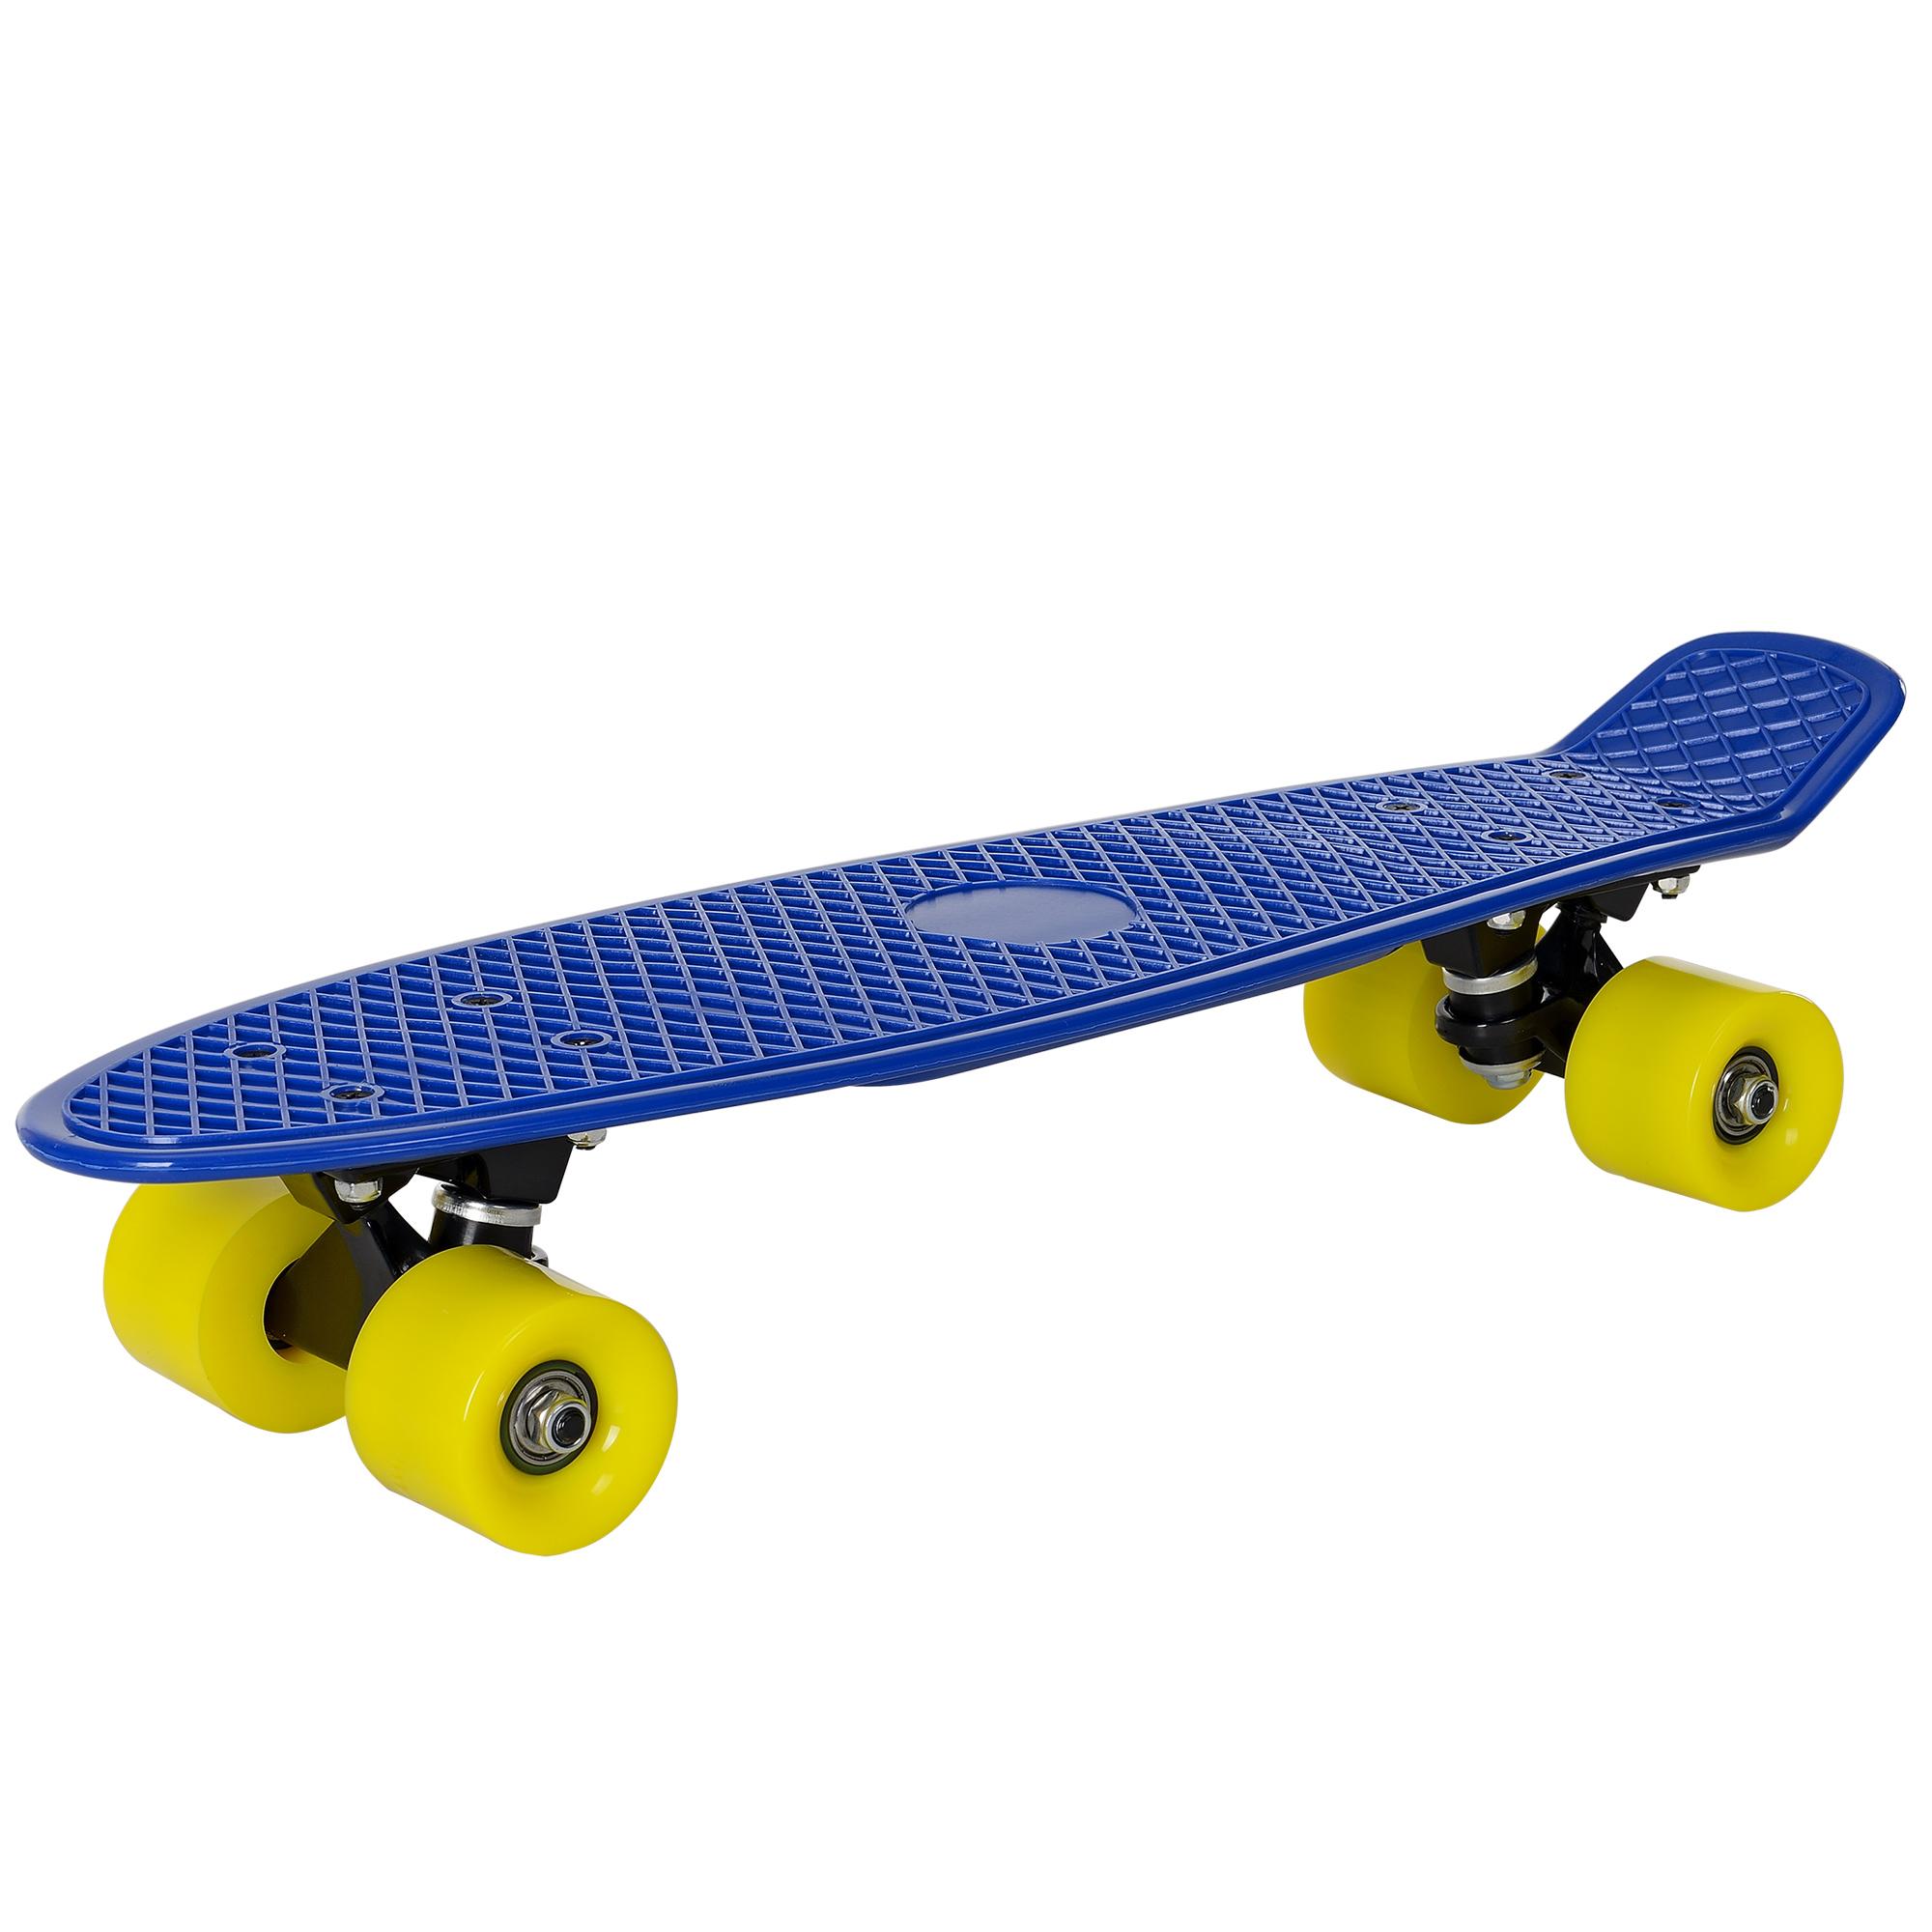 [pro.tec]® Retro Skateboard mini - penny board ABEC 7 - modrá se žlutými válečky